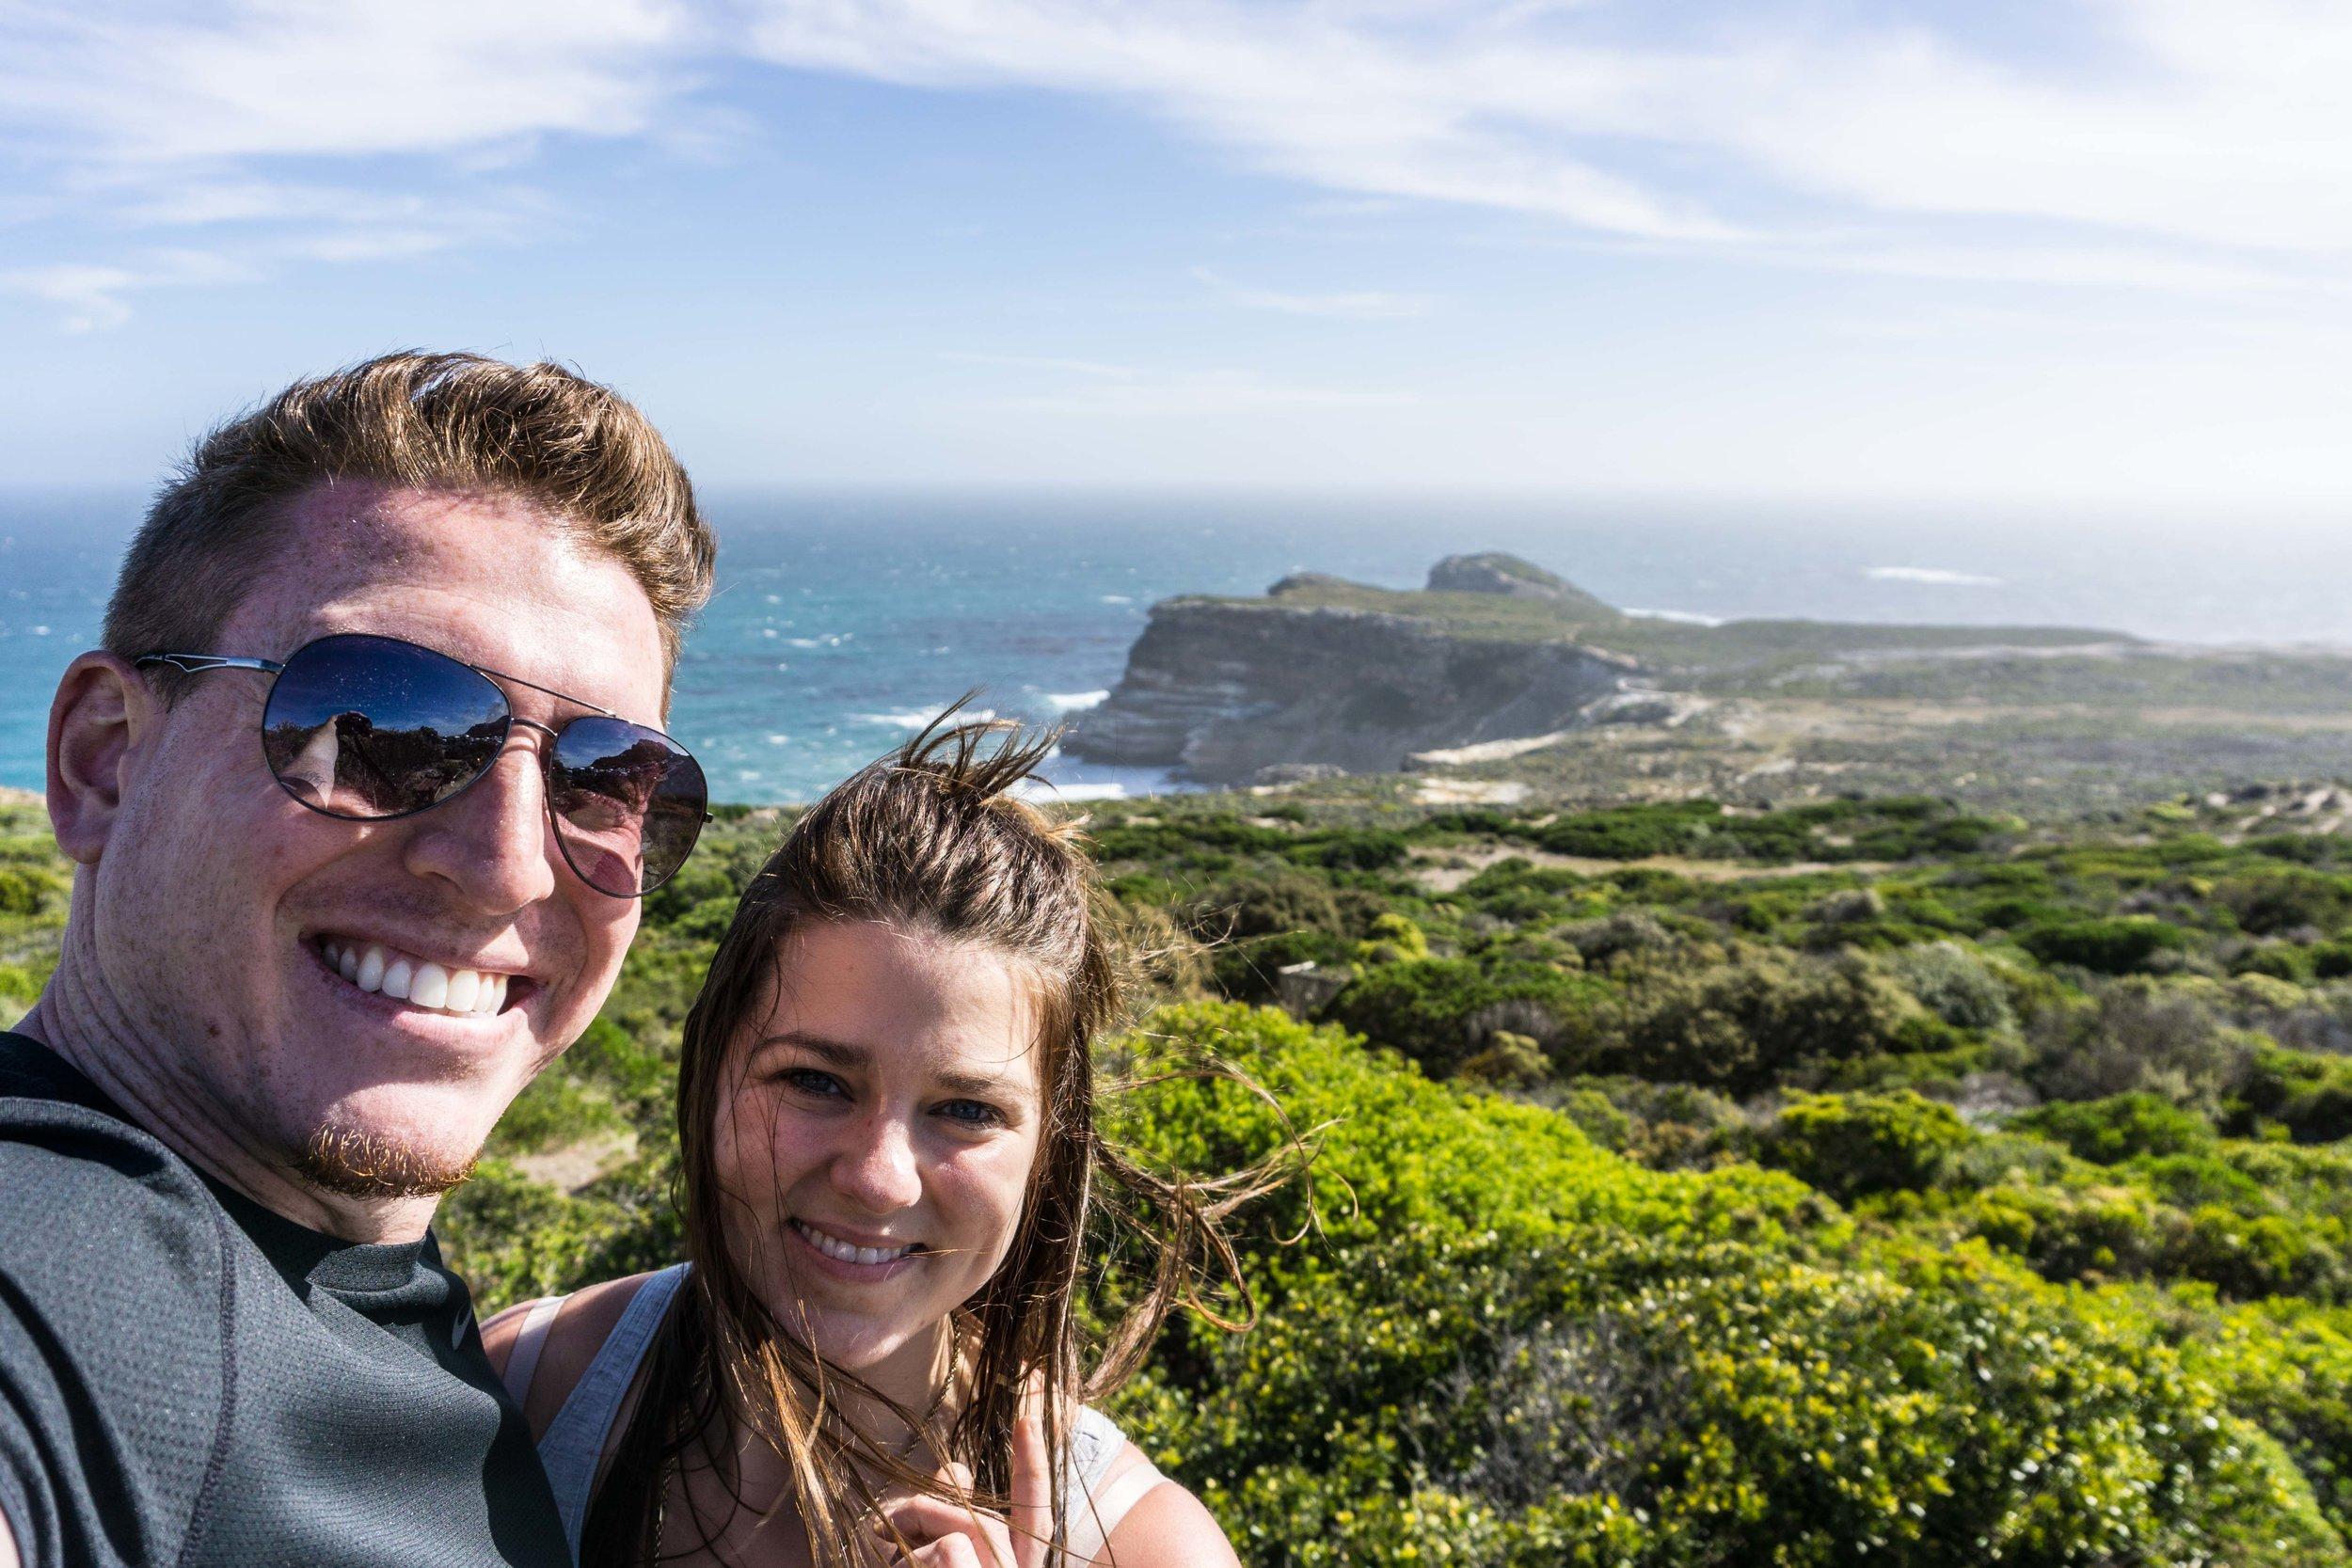 South-Africa-06588.jpg